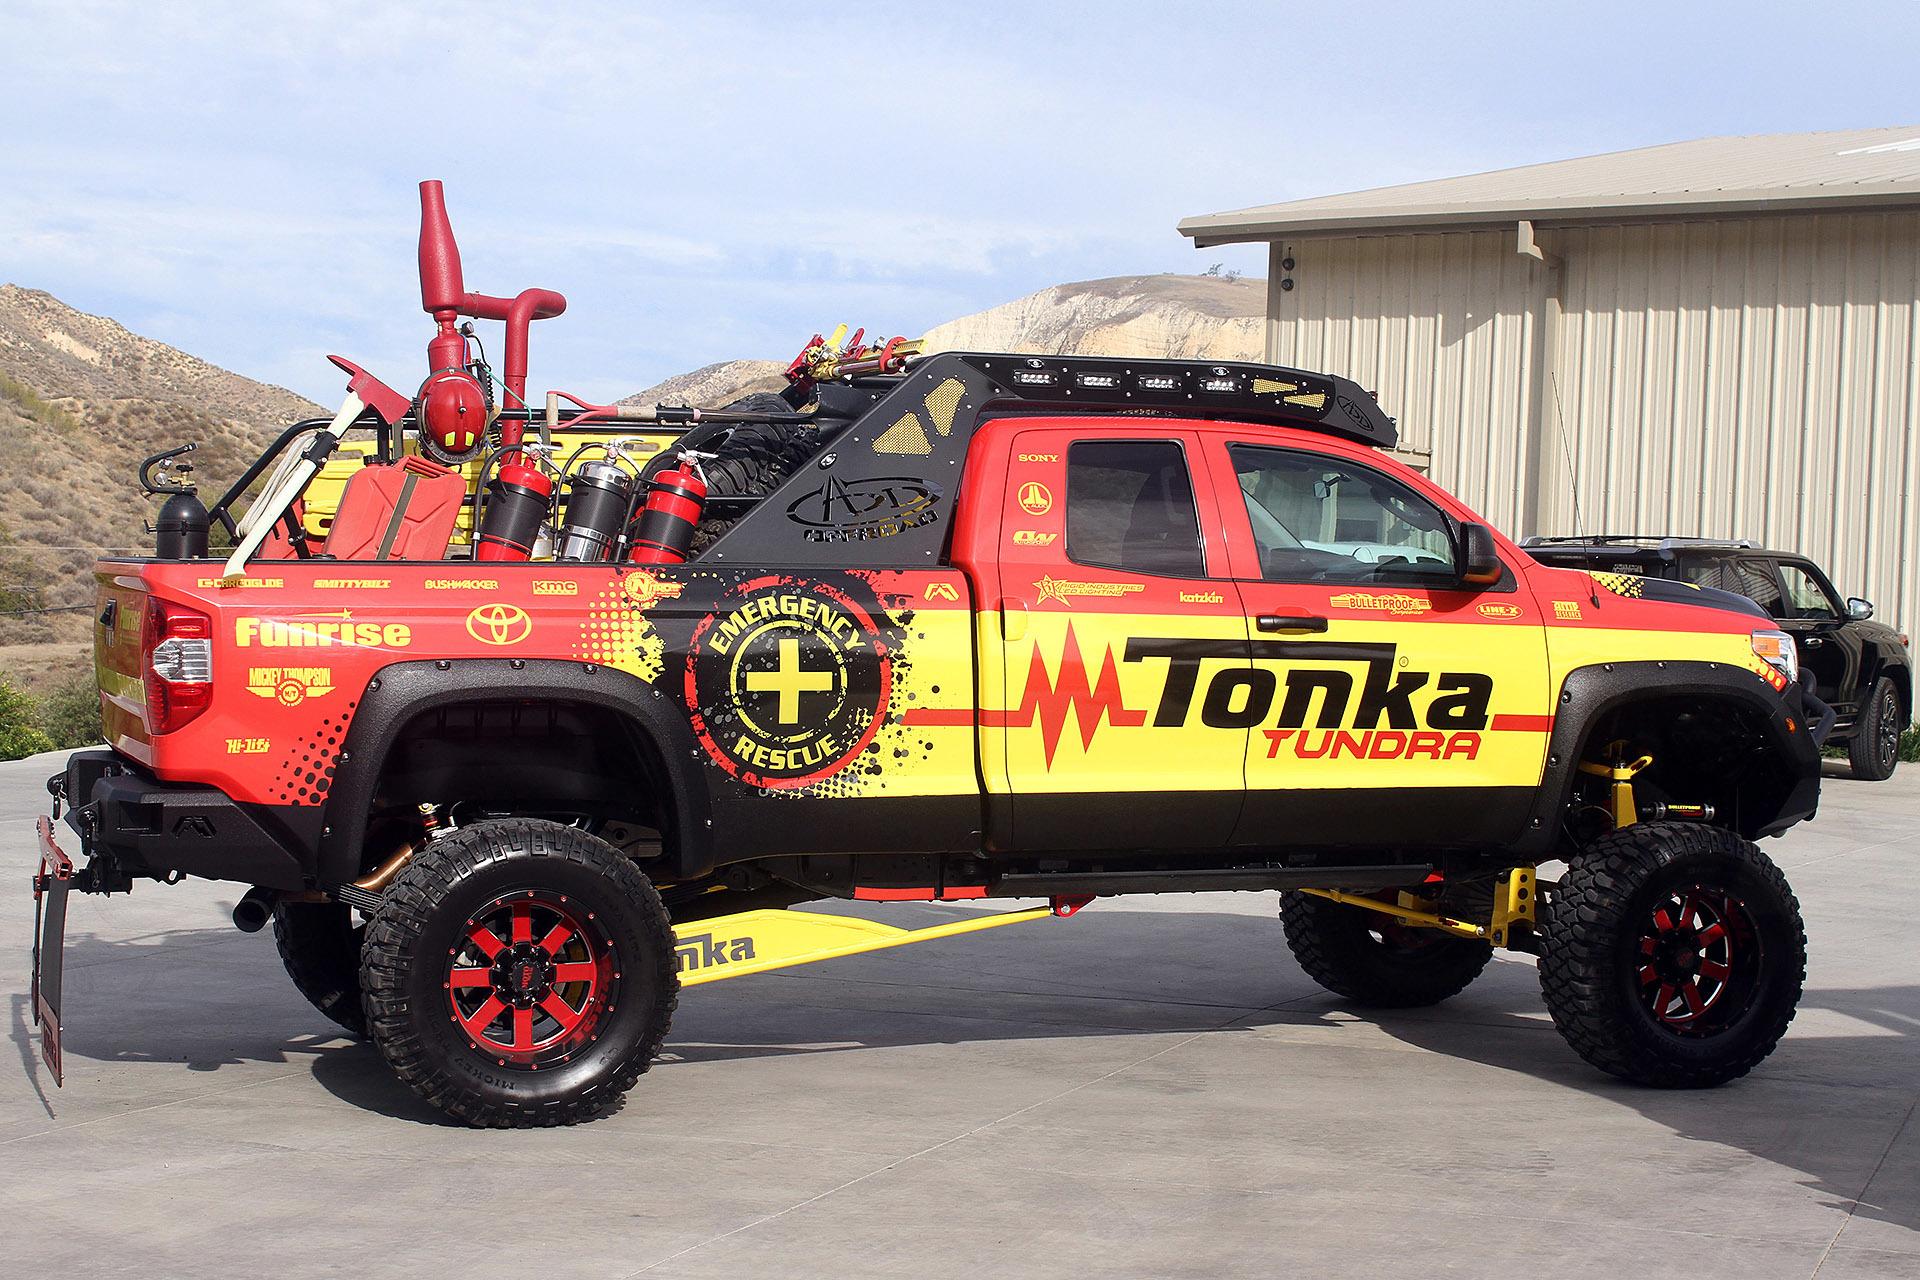 T Rex Tundra Overlander Trucks By Tonka 13